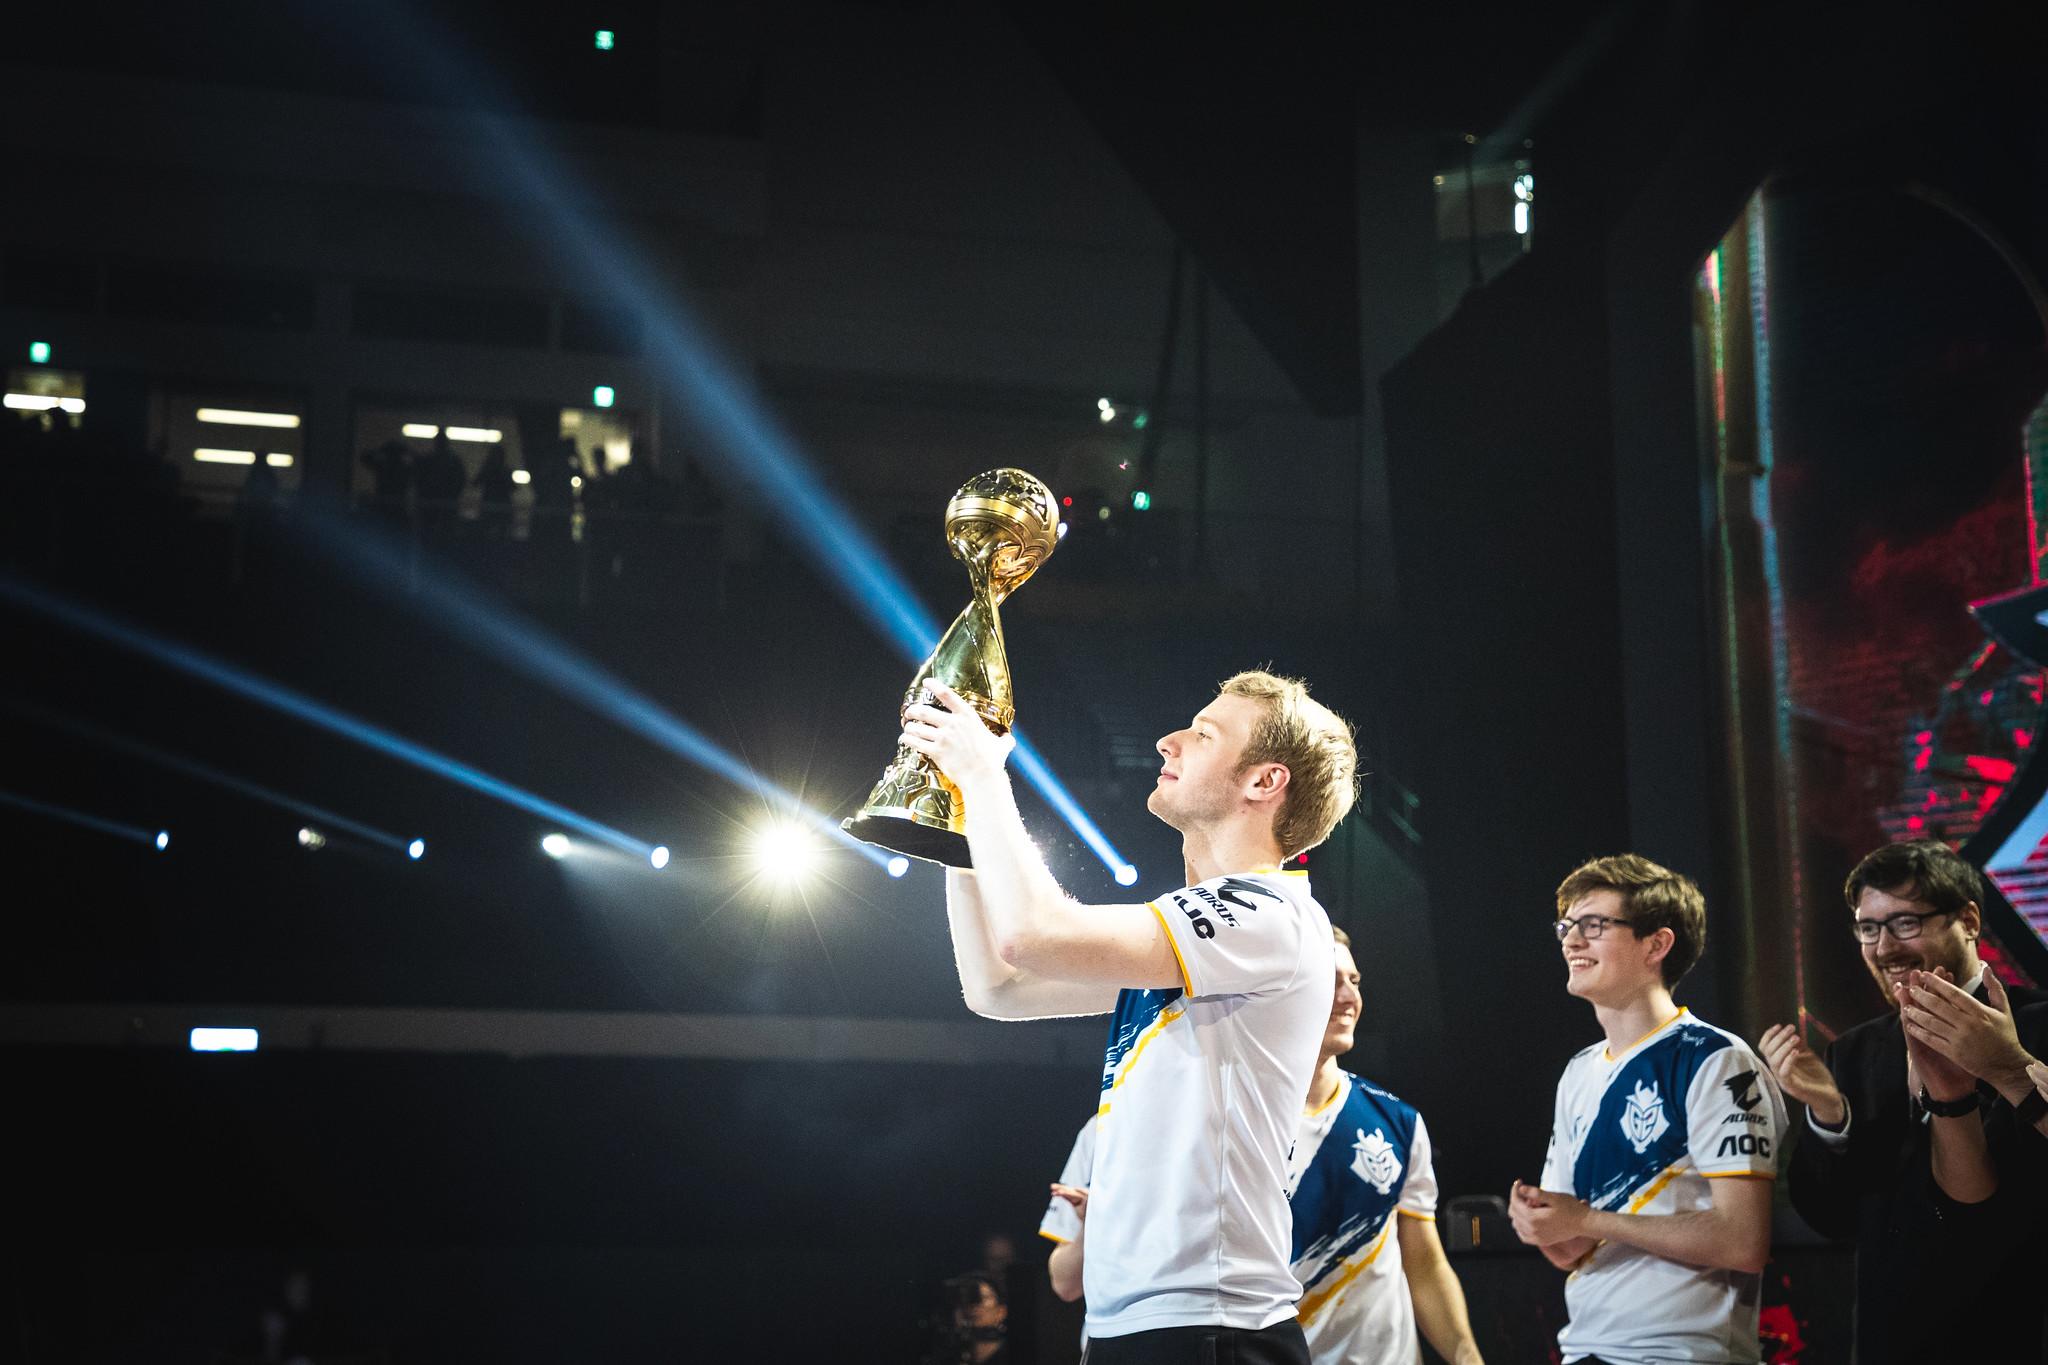 Jankos hoists the MSI trophy